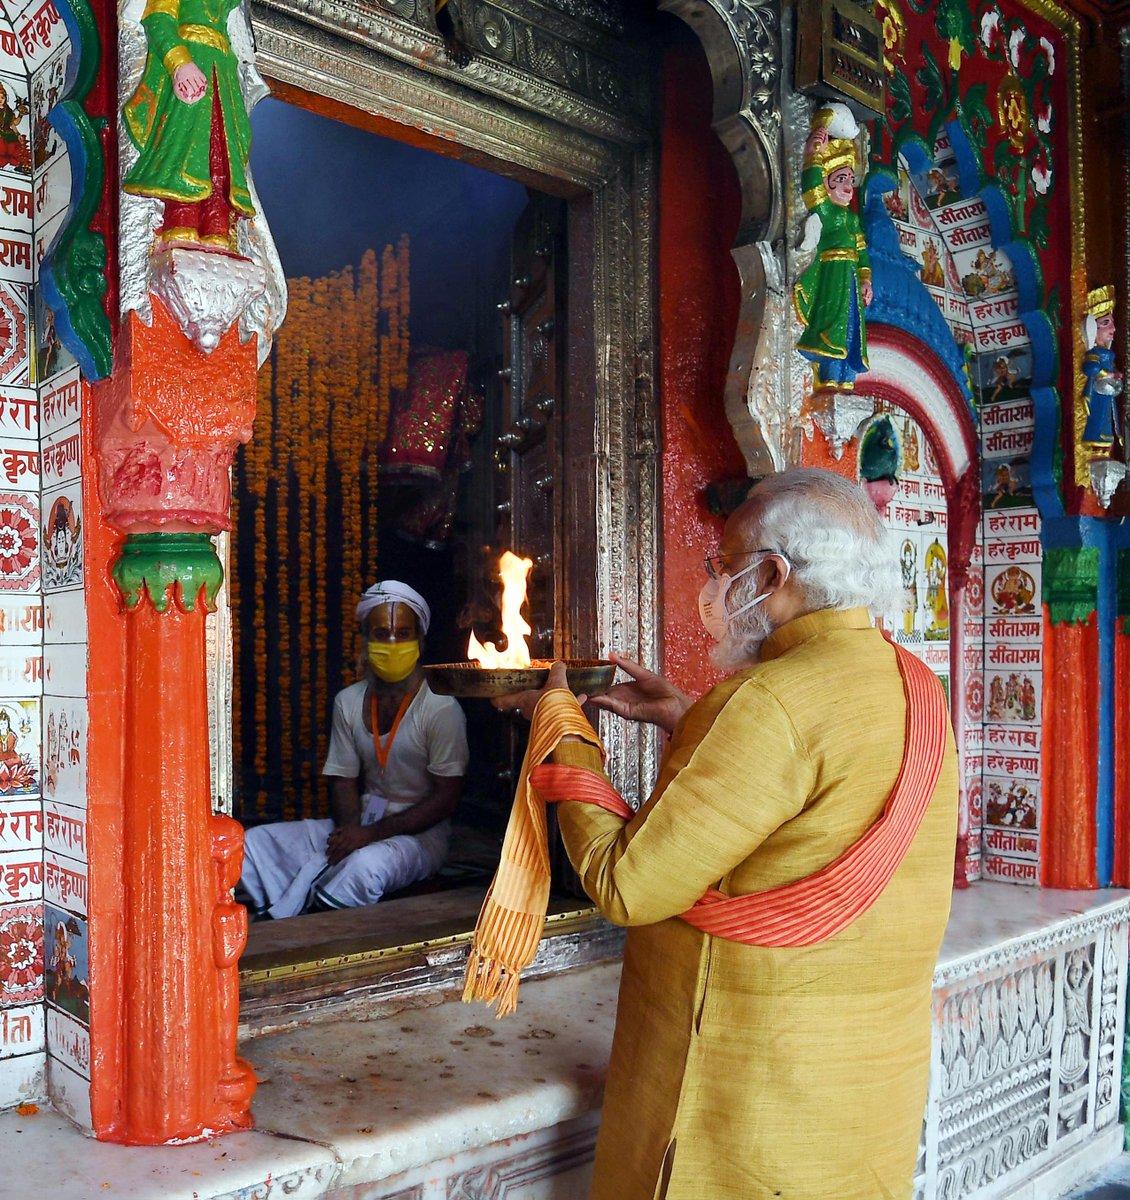 Prayed at  the sacred Hanumangarhi and sought Lord Hanuman's blessings. https://t.co/Jbf4X04Mxh